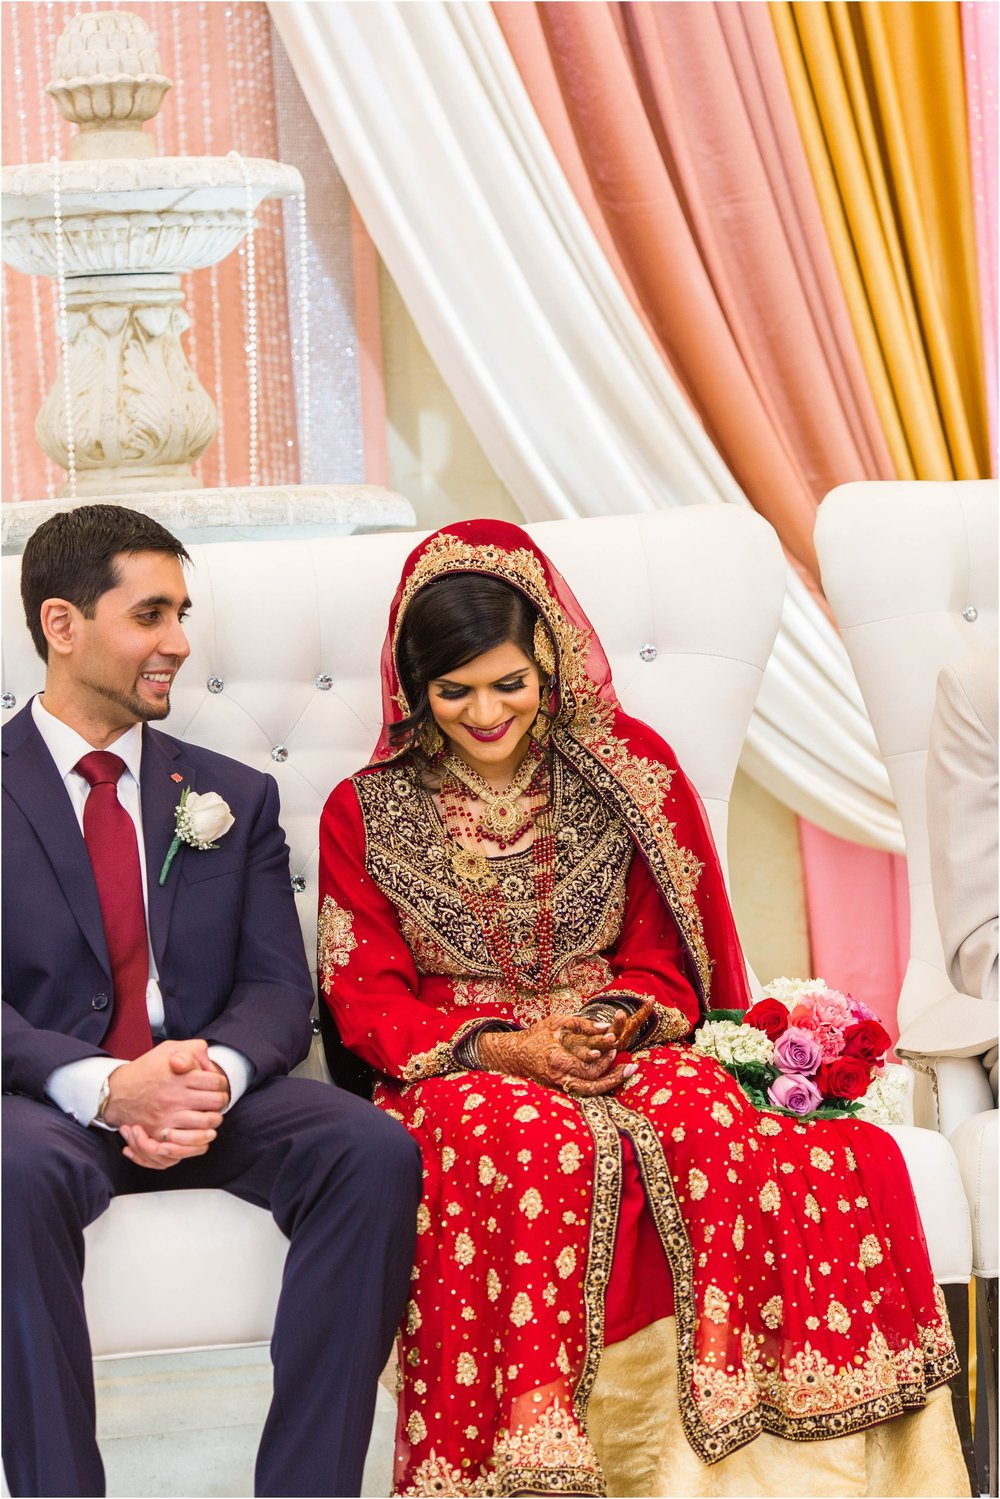 Estate-Banquet-Hall-Wedding-Toronto-Mississauga-Brampton-Scarborough-GTA-Pakistani-Indian-Wedding-Engagement-Photographer-Photography_0033.jpg